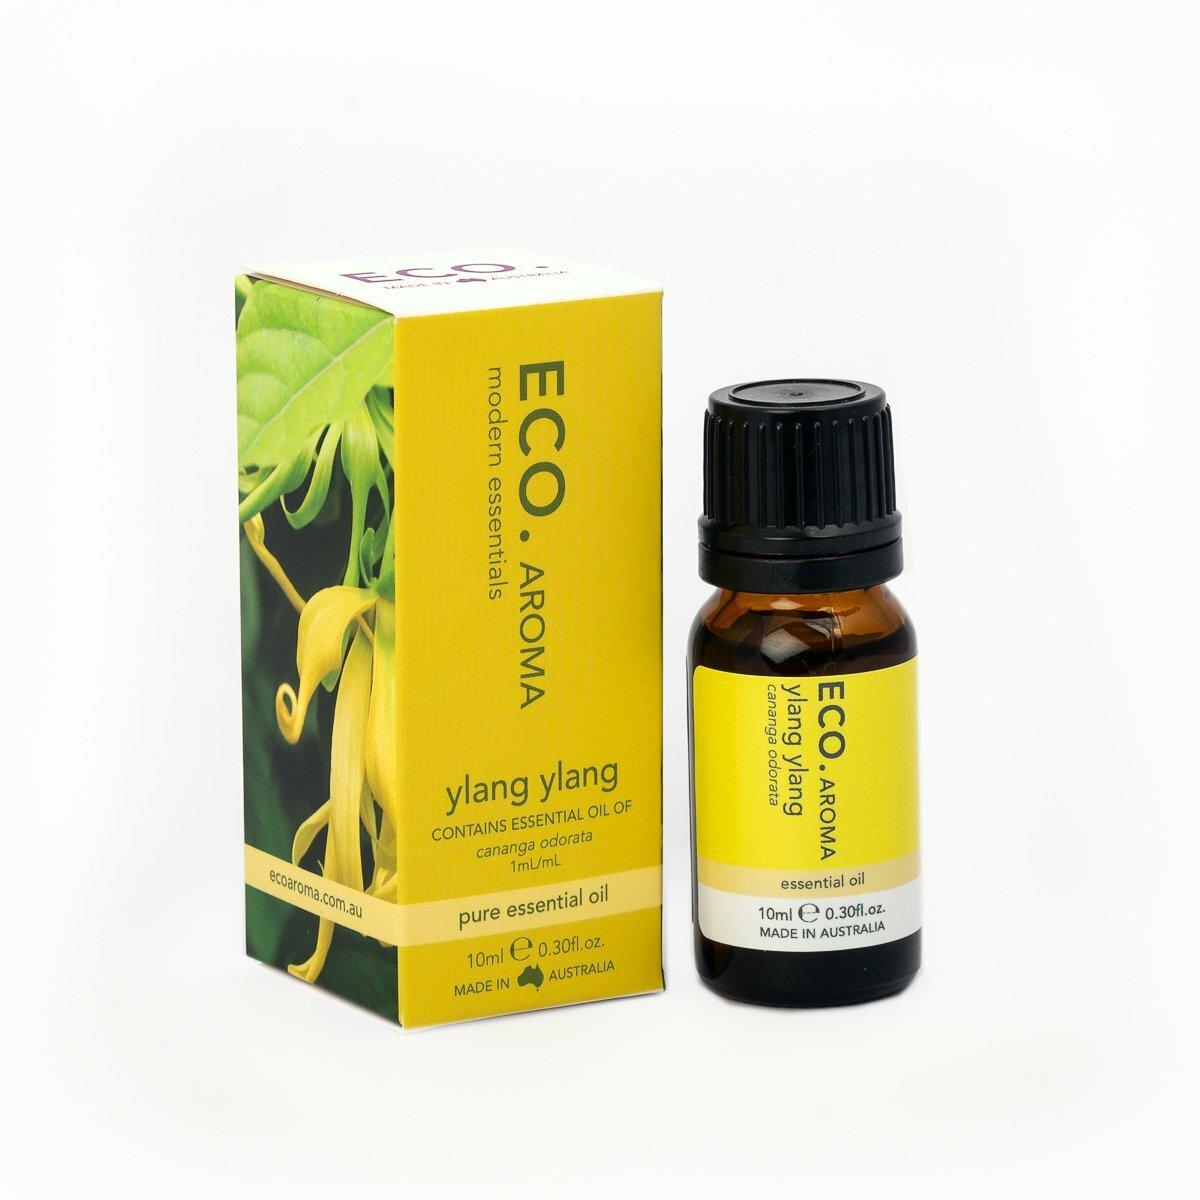 Eco Modern Essentials Oils 10ml - Ylang Ylang